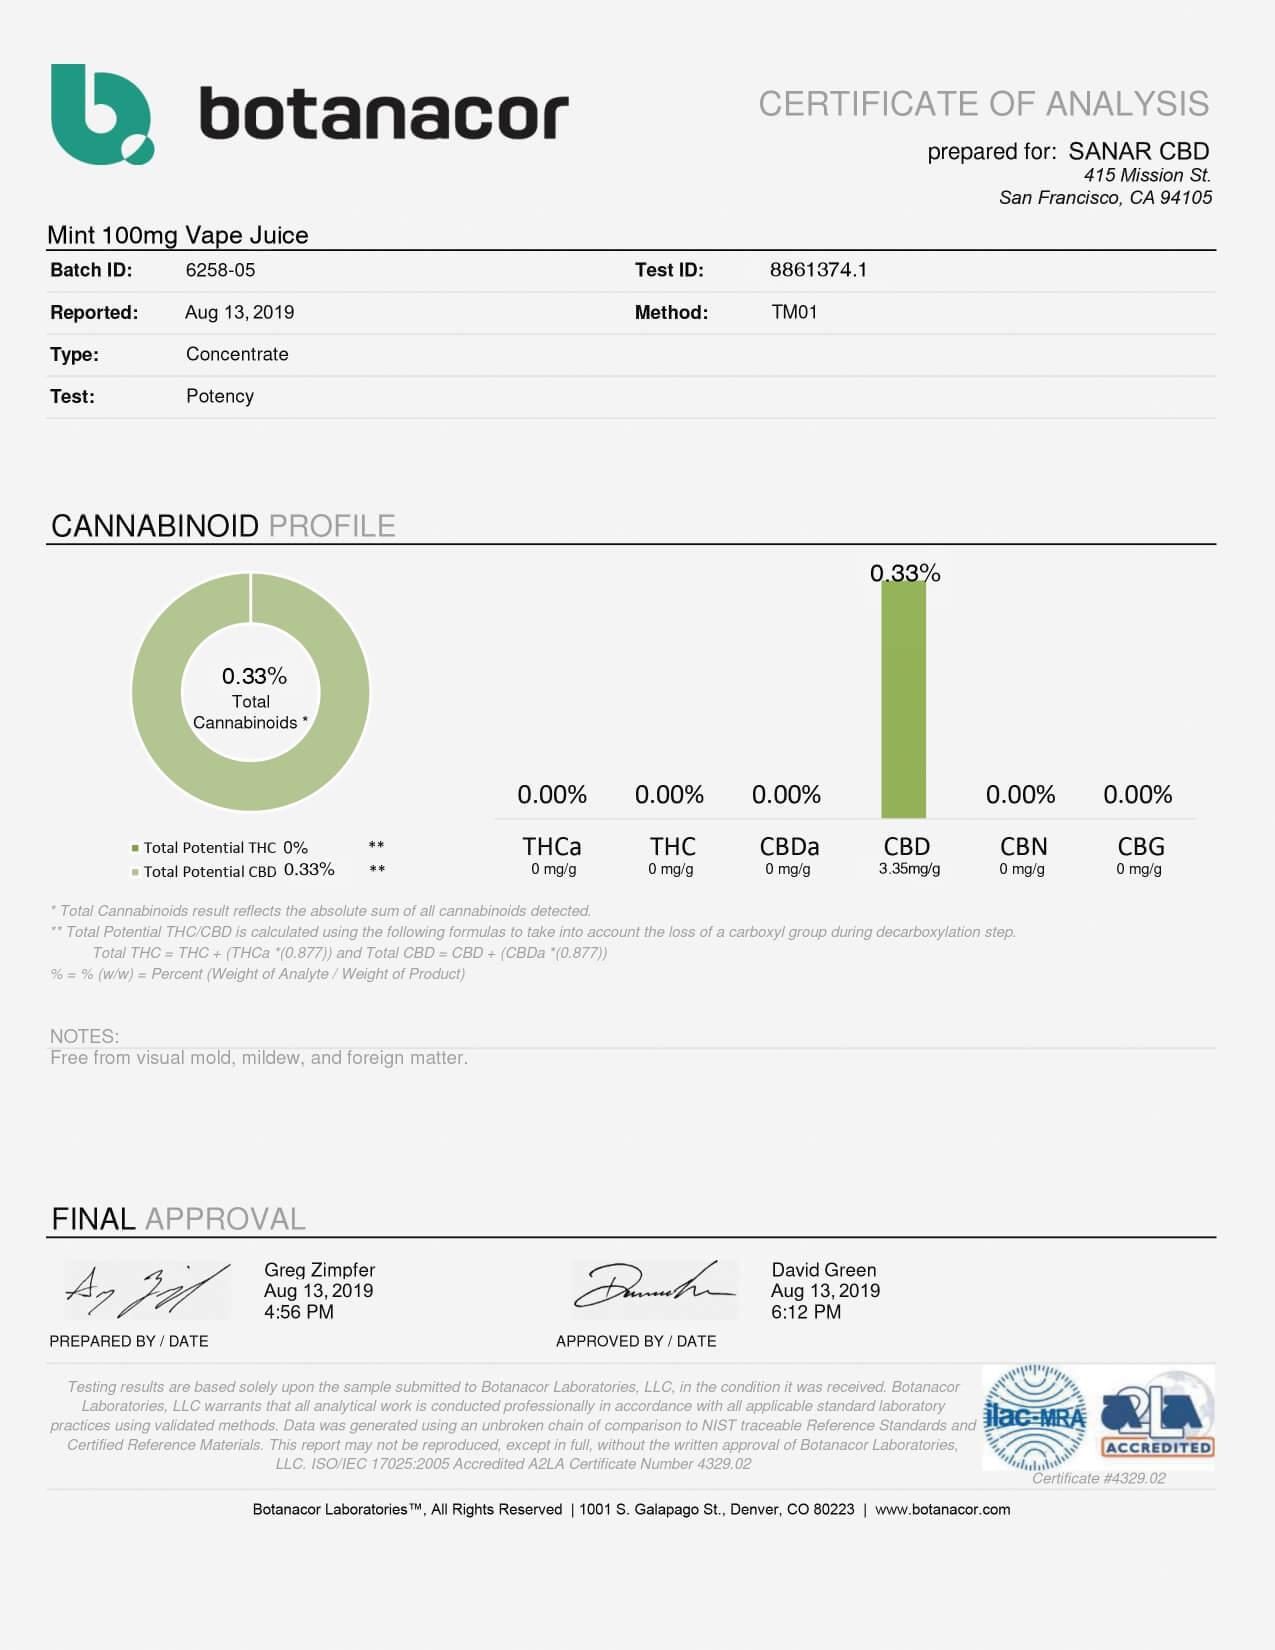 Sanar CBD Vape Juice Mint 100mg Lab Report